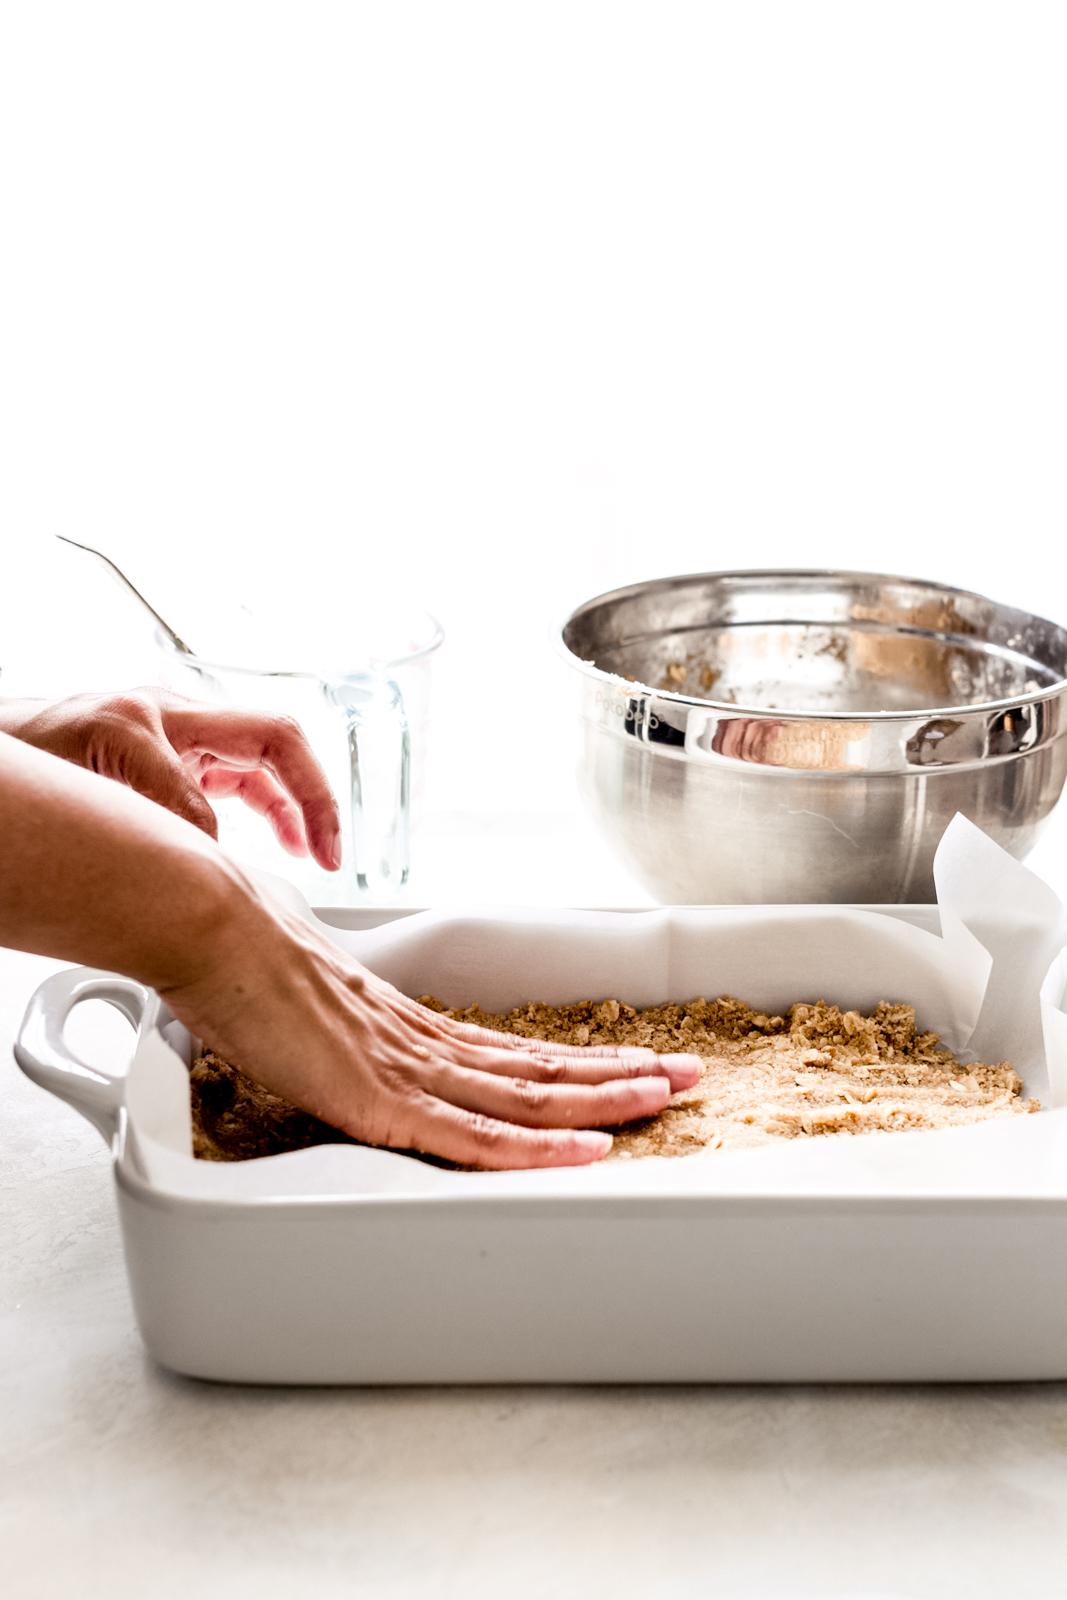 hand pressing bar crust in white baking dish